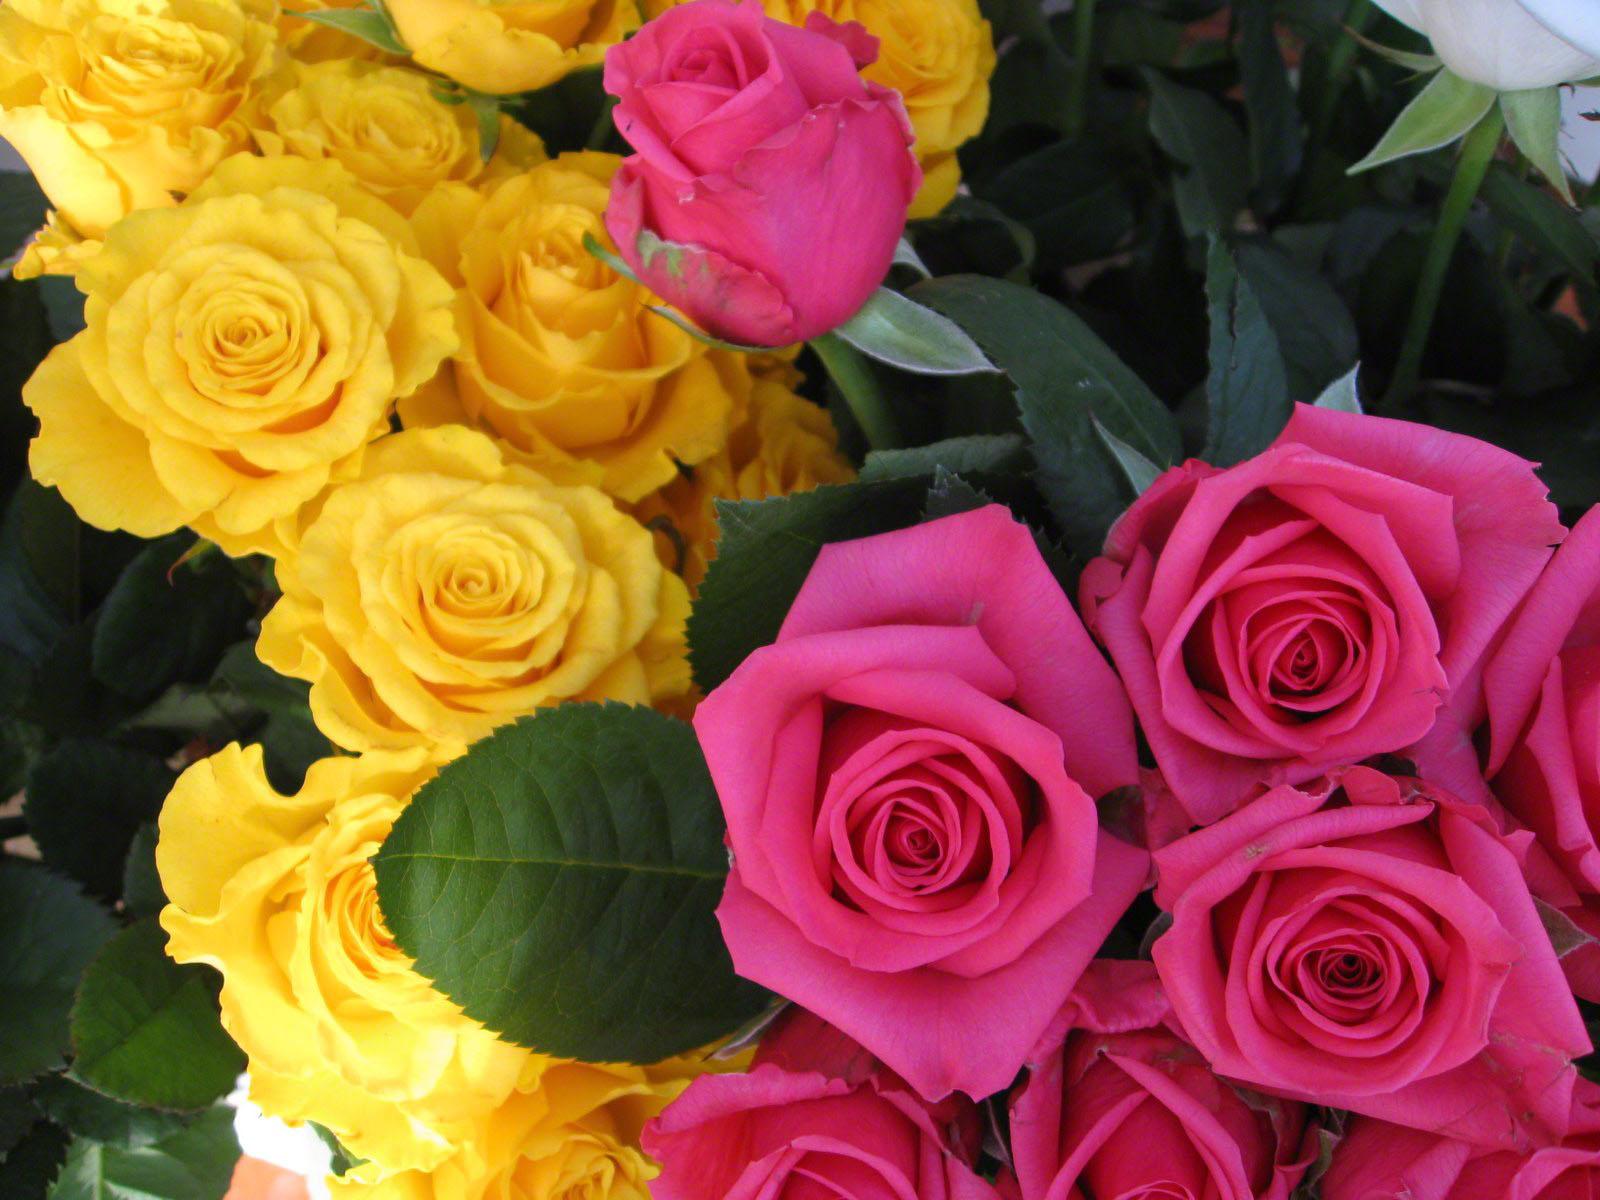 http://www.fabiovisentin.com/photography/photo/12/roses-wallpaper-roses-bouquets4350.JPG